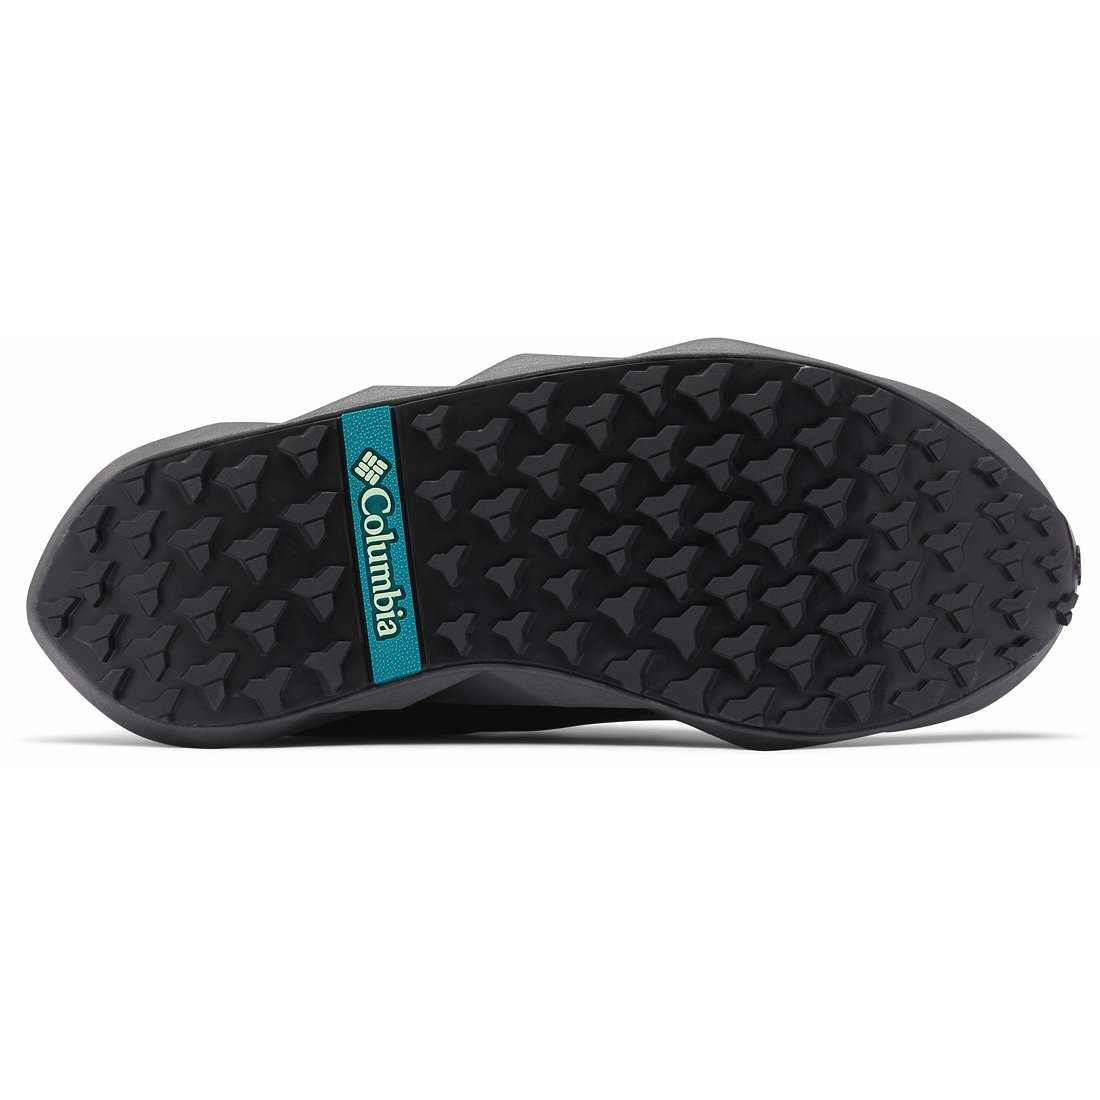 נעלי טיולים לנשים - Facet 60 Low Outdry W - Columbia